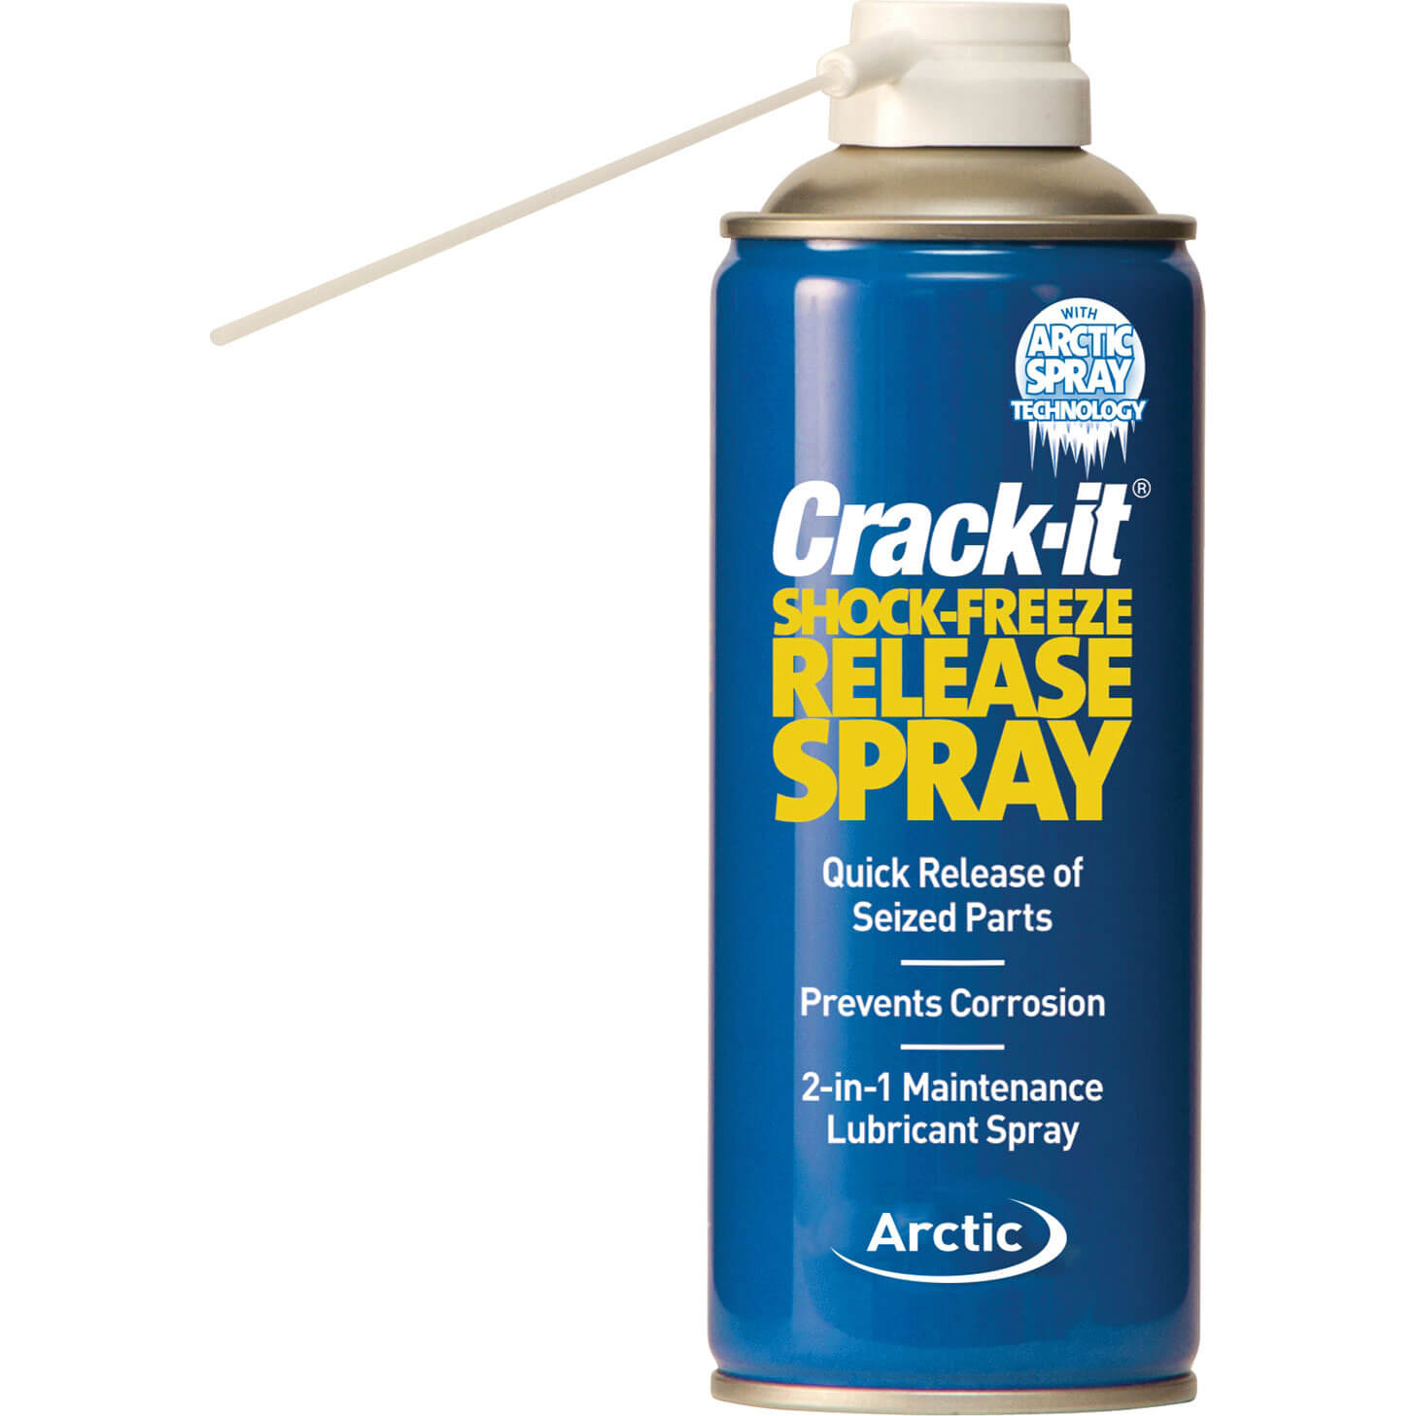 Image of Arctic Hayes Crack It Shock Freeze Release Spray 400ml